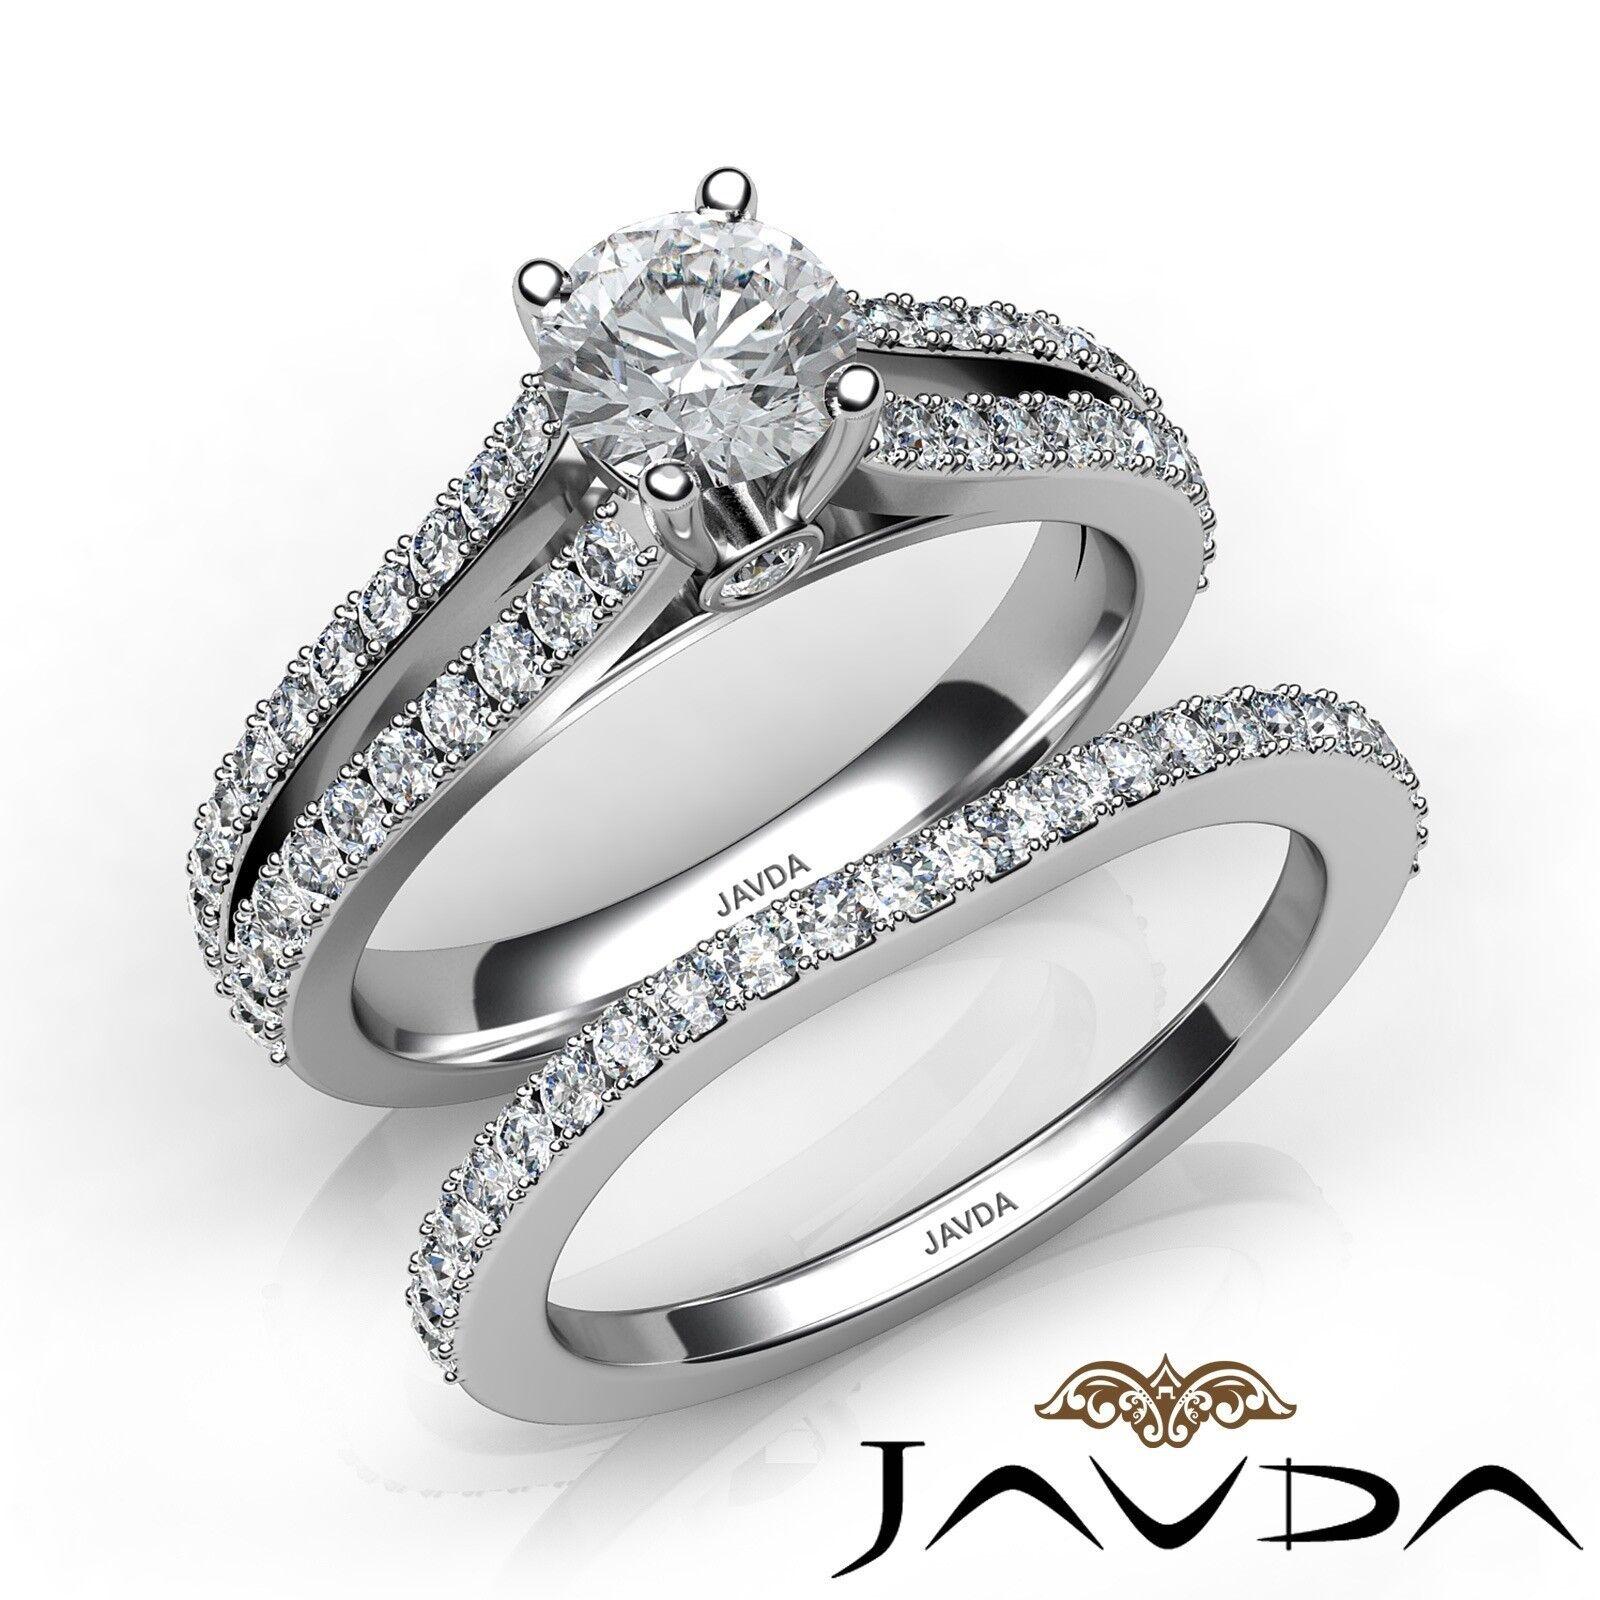 2.15ctw Peekaboo Wedding Bridal Round Diamond Engagement Ring GIA G-VS2 W Gold